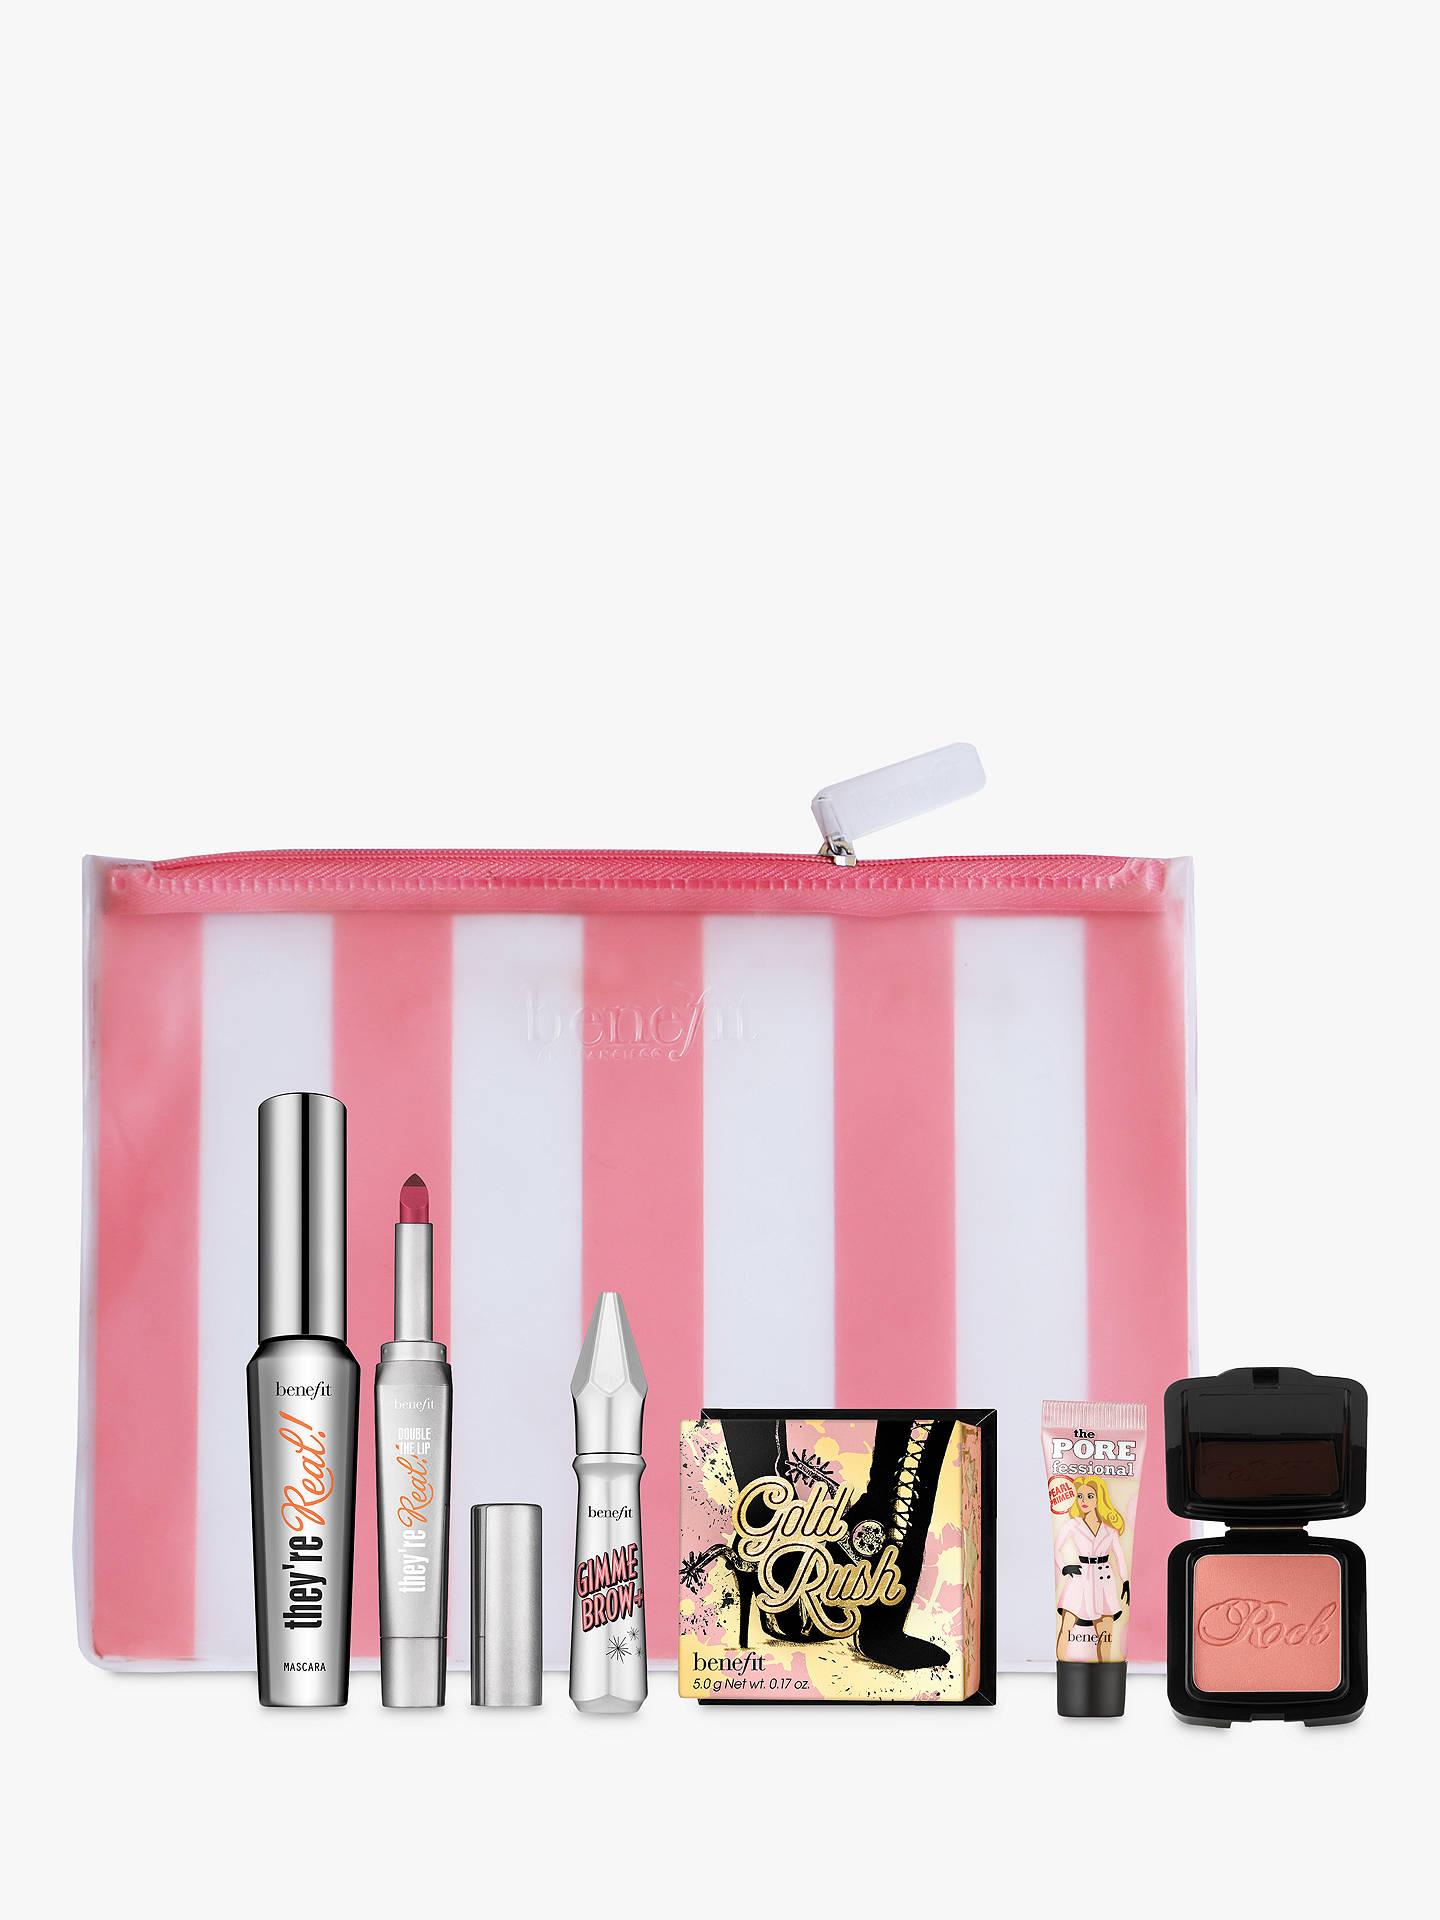 18a2402f9 Buy Benefit Best Sellers Makeup Gift Set Online at johnlewis.com ...